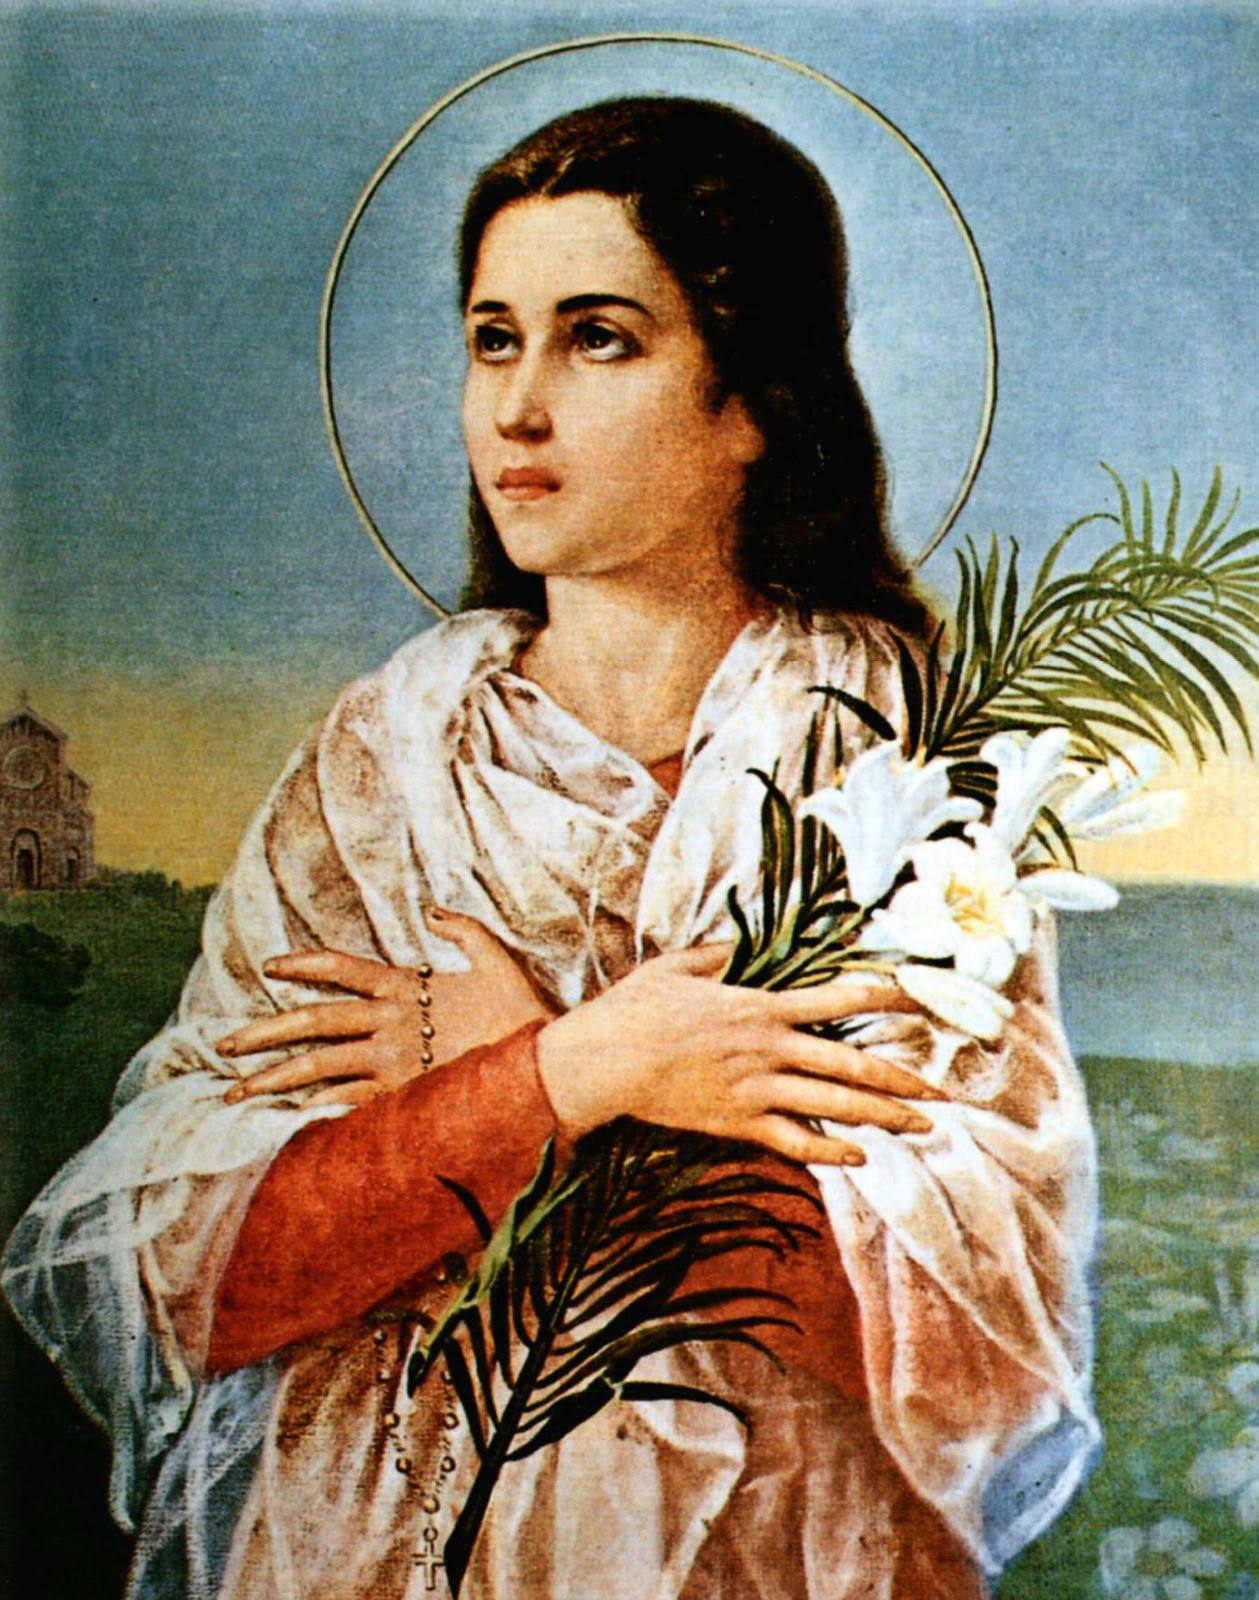 WELCOME TO ST. MARIA GORETTI